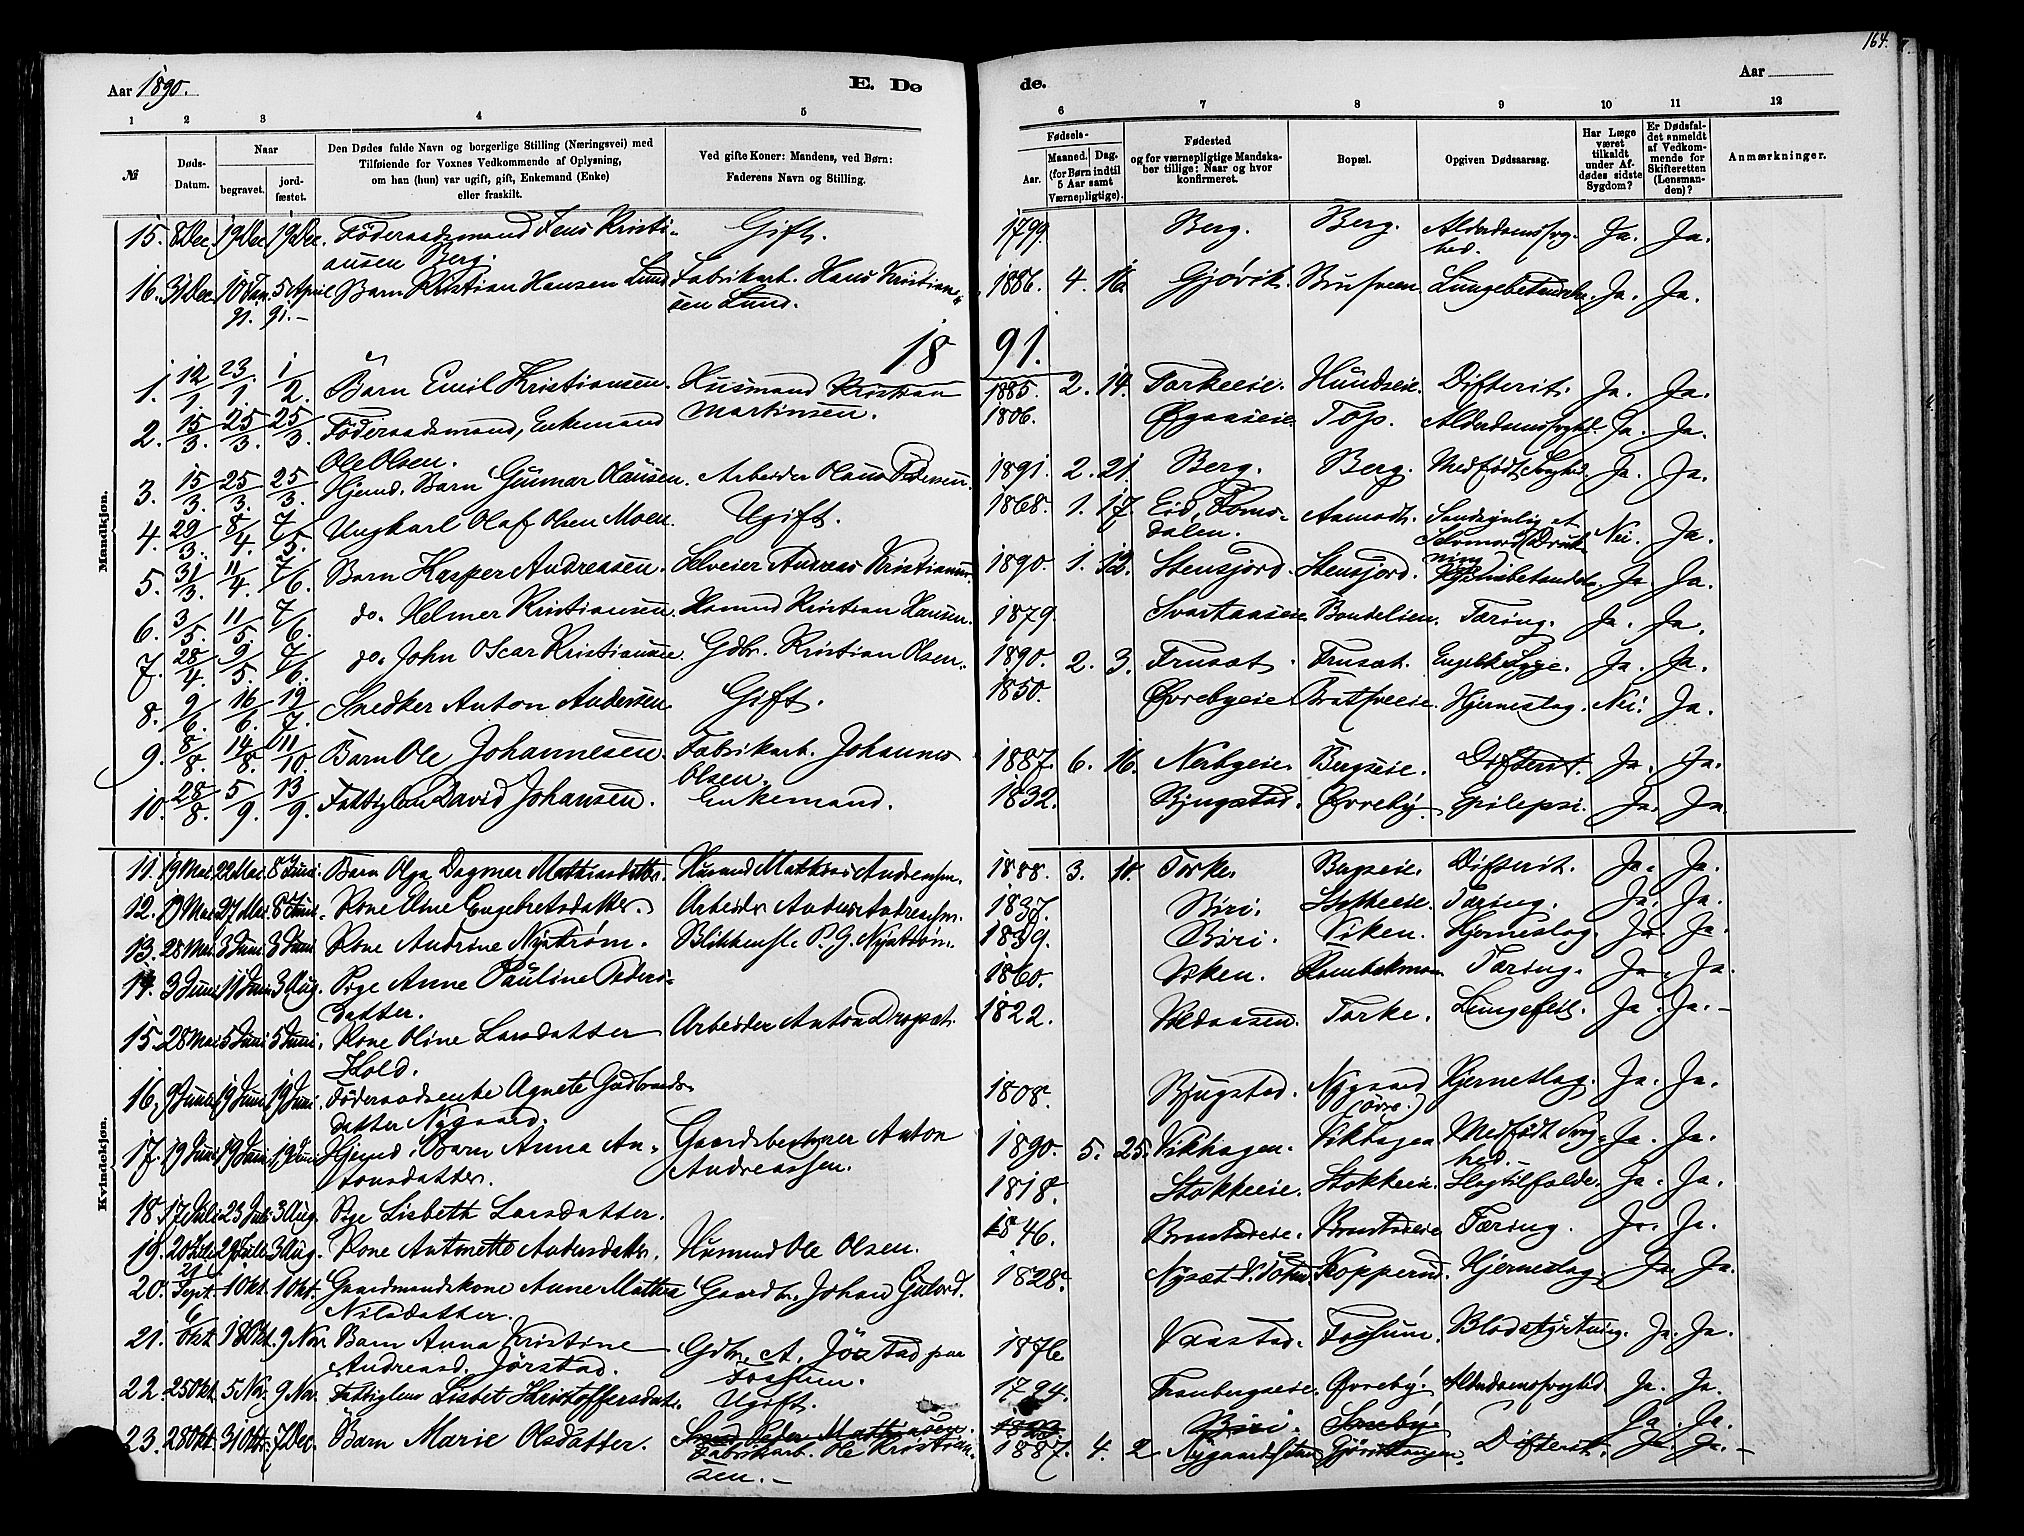 SAH, Vardal prestekontor, H/Ha/Haa/L0009: Ministerialbok nr. 9, 1878-1892, s. 164